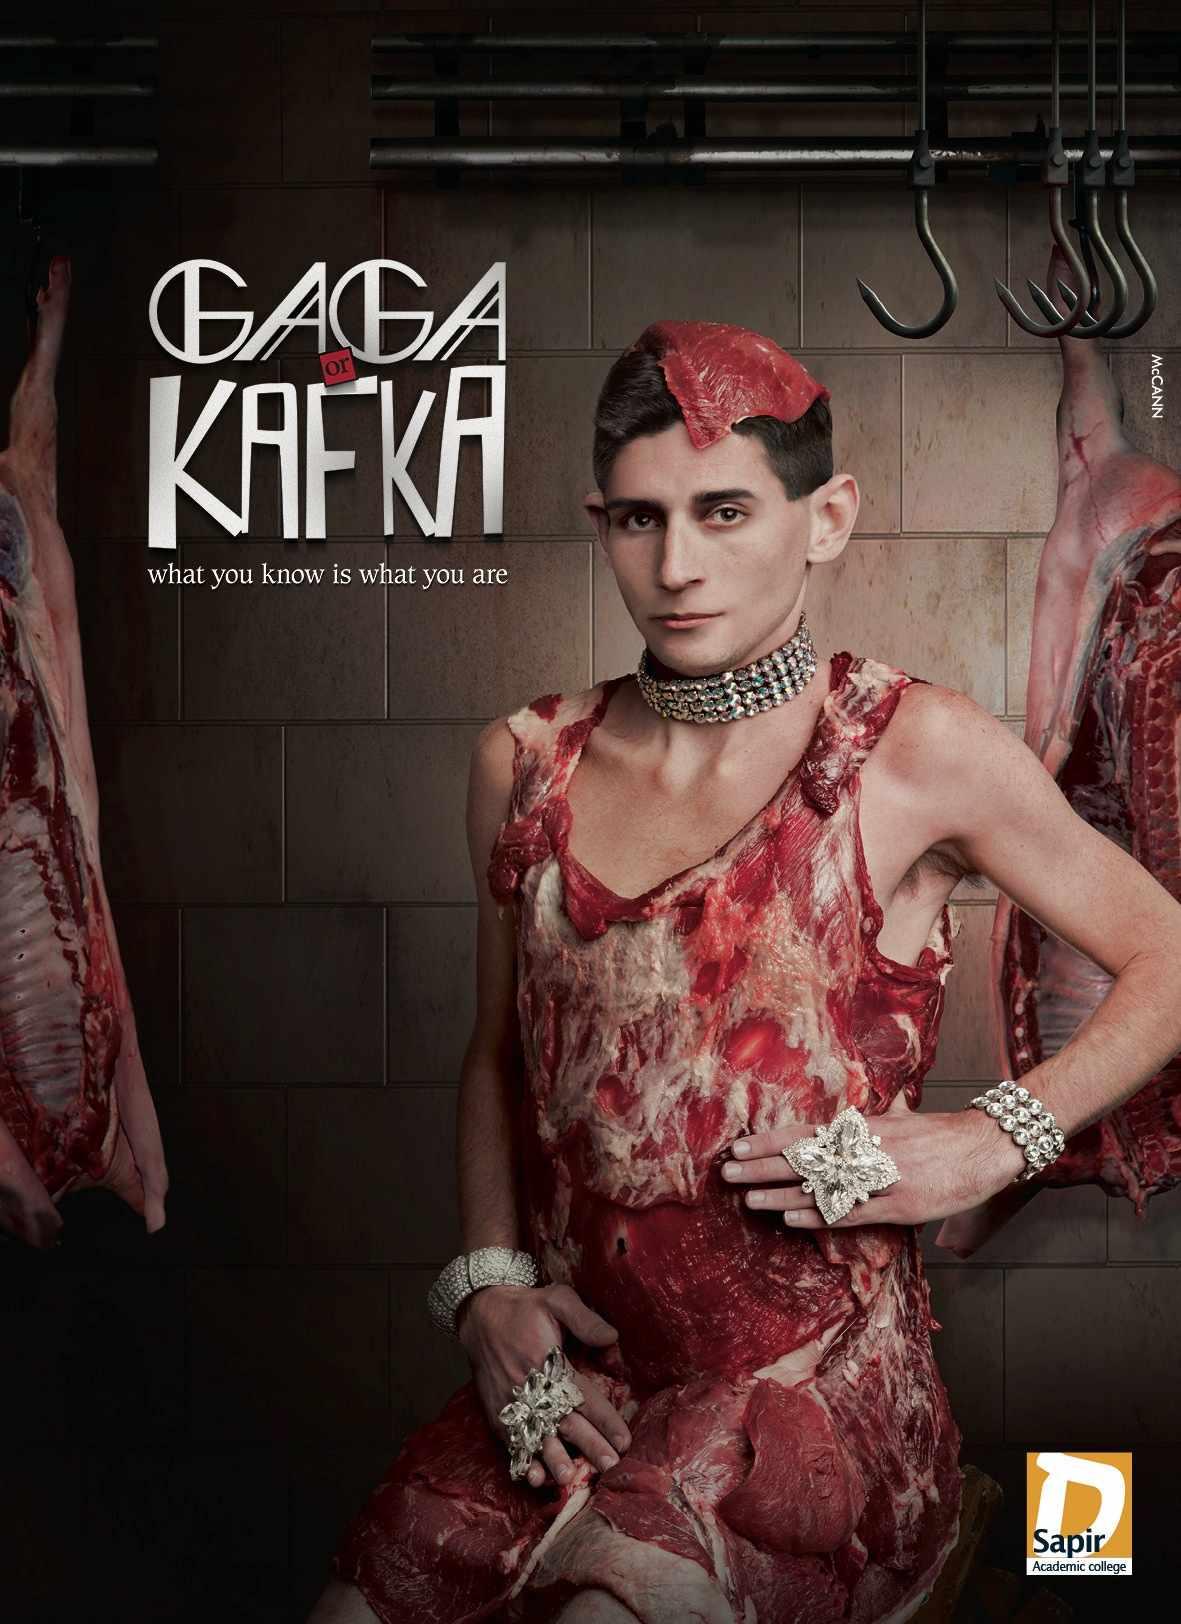 Kafka_Merca